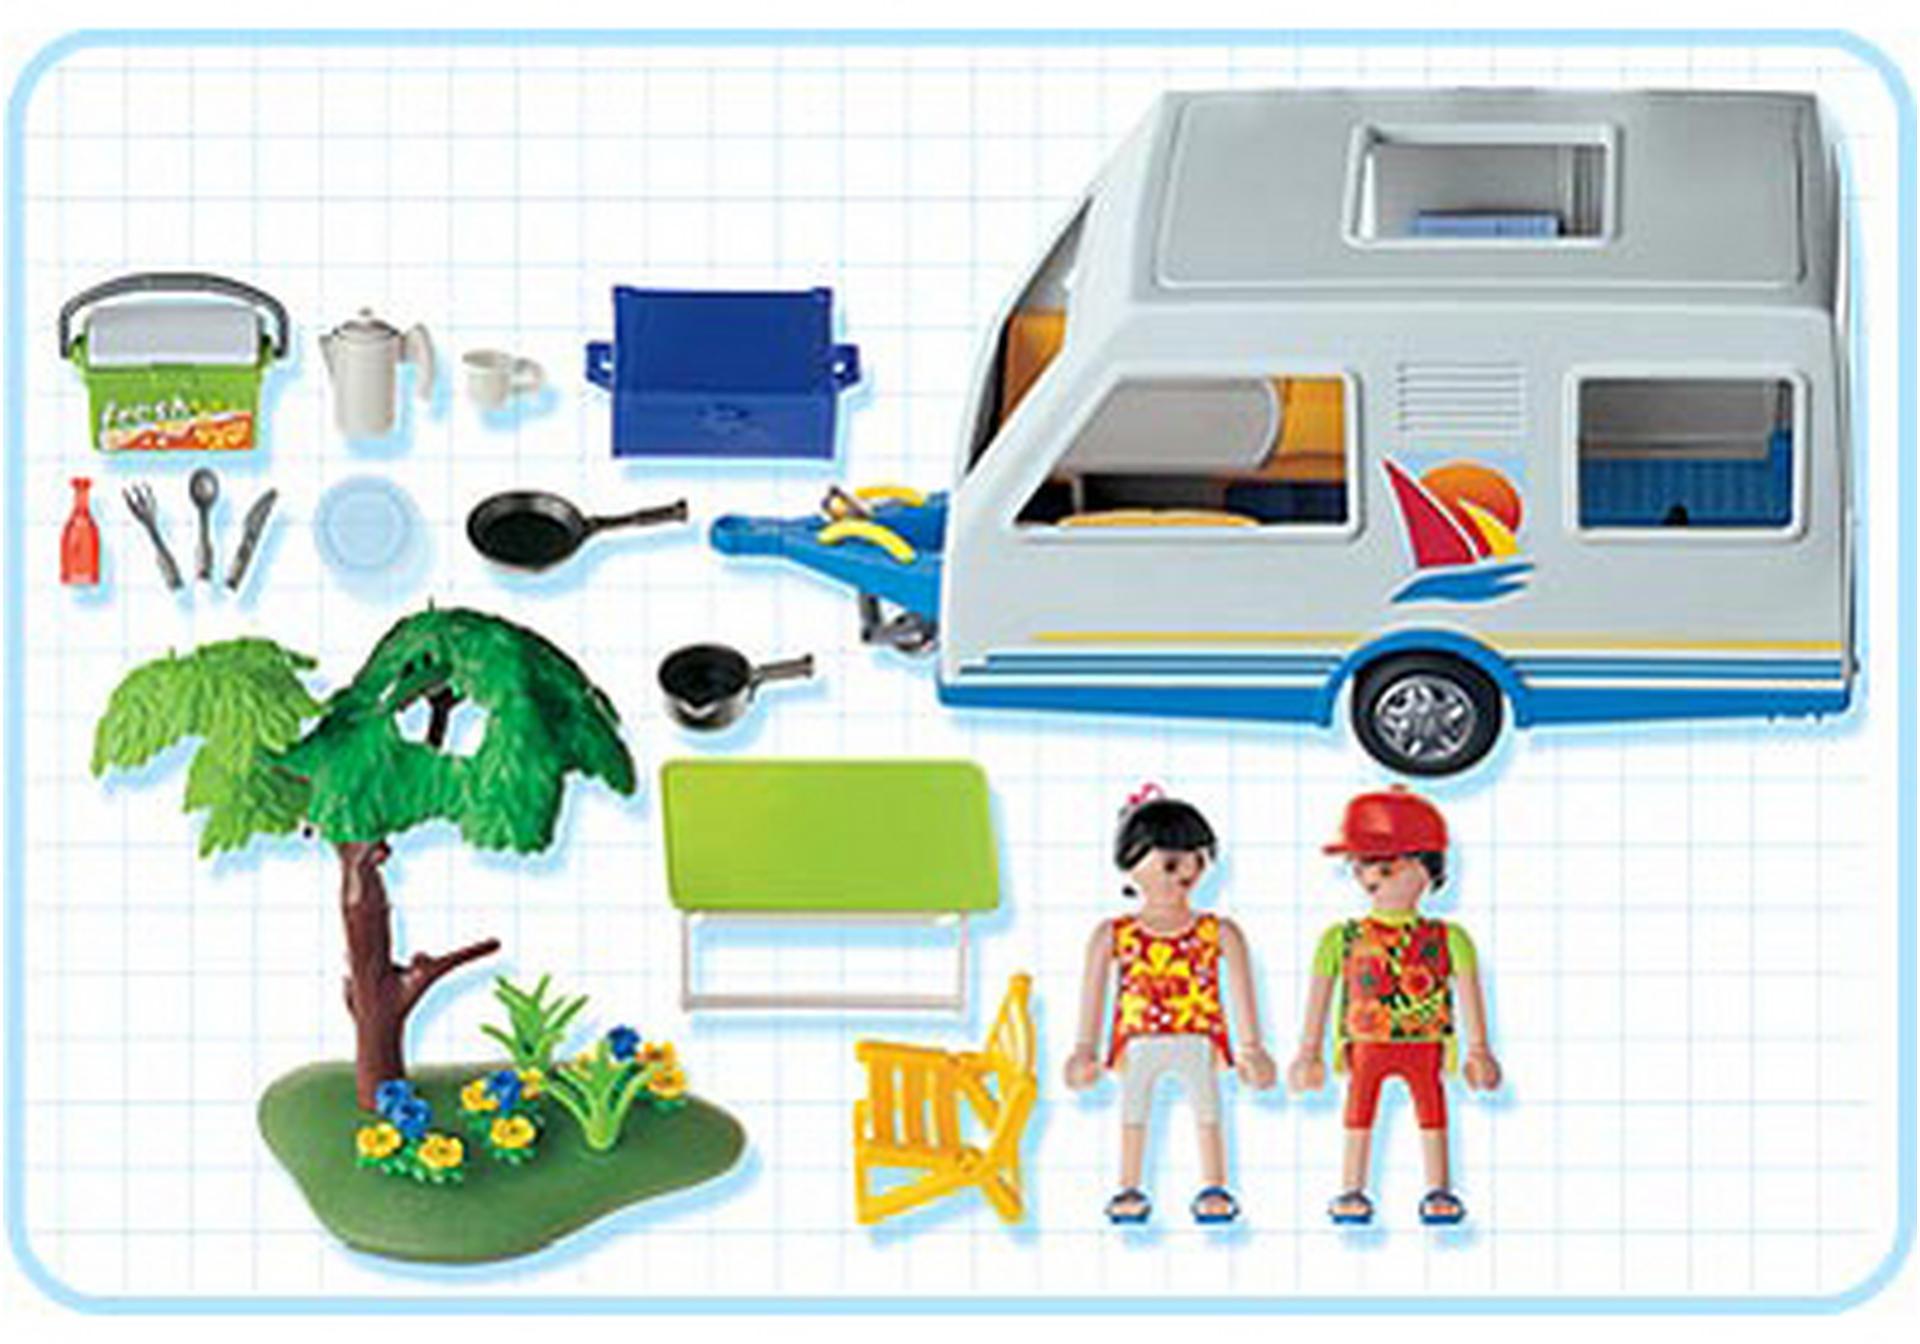 parents caravane 3236 c playmobil france. Black Bedroom Furniture Sets. Home Design Ideas